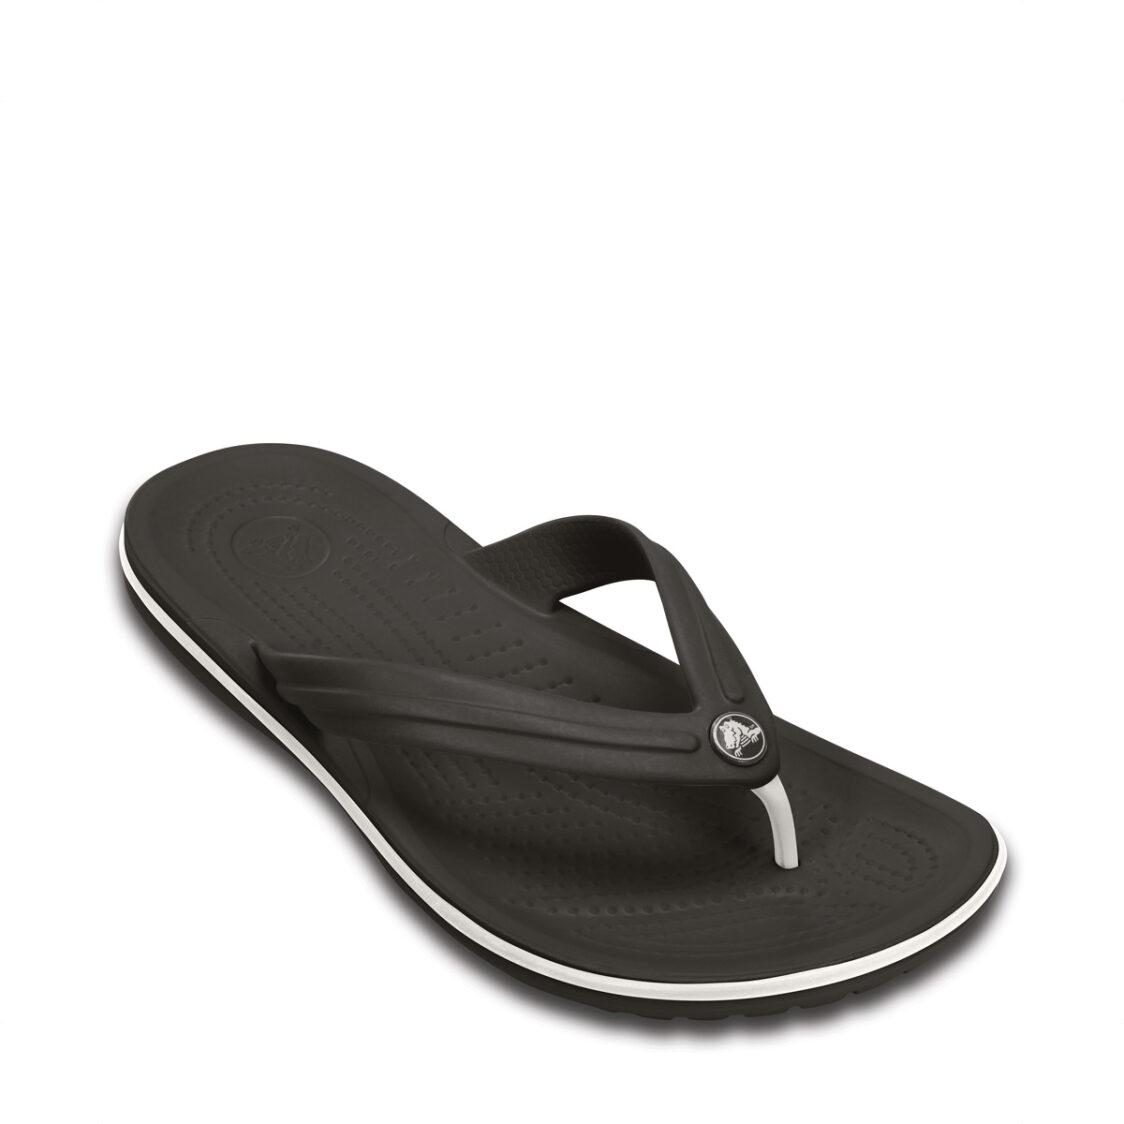 Crocs Crocband Flip 11033-001 Black